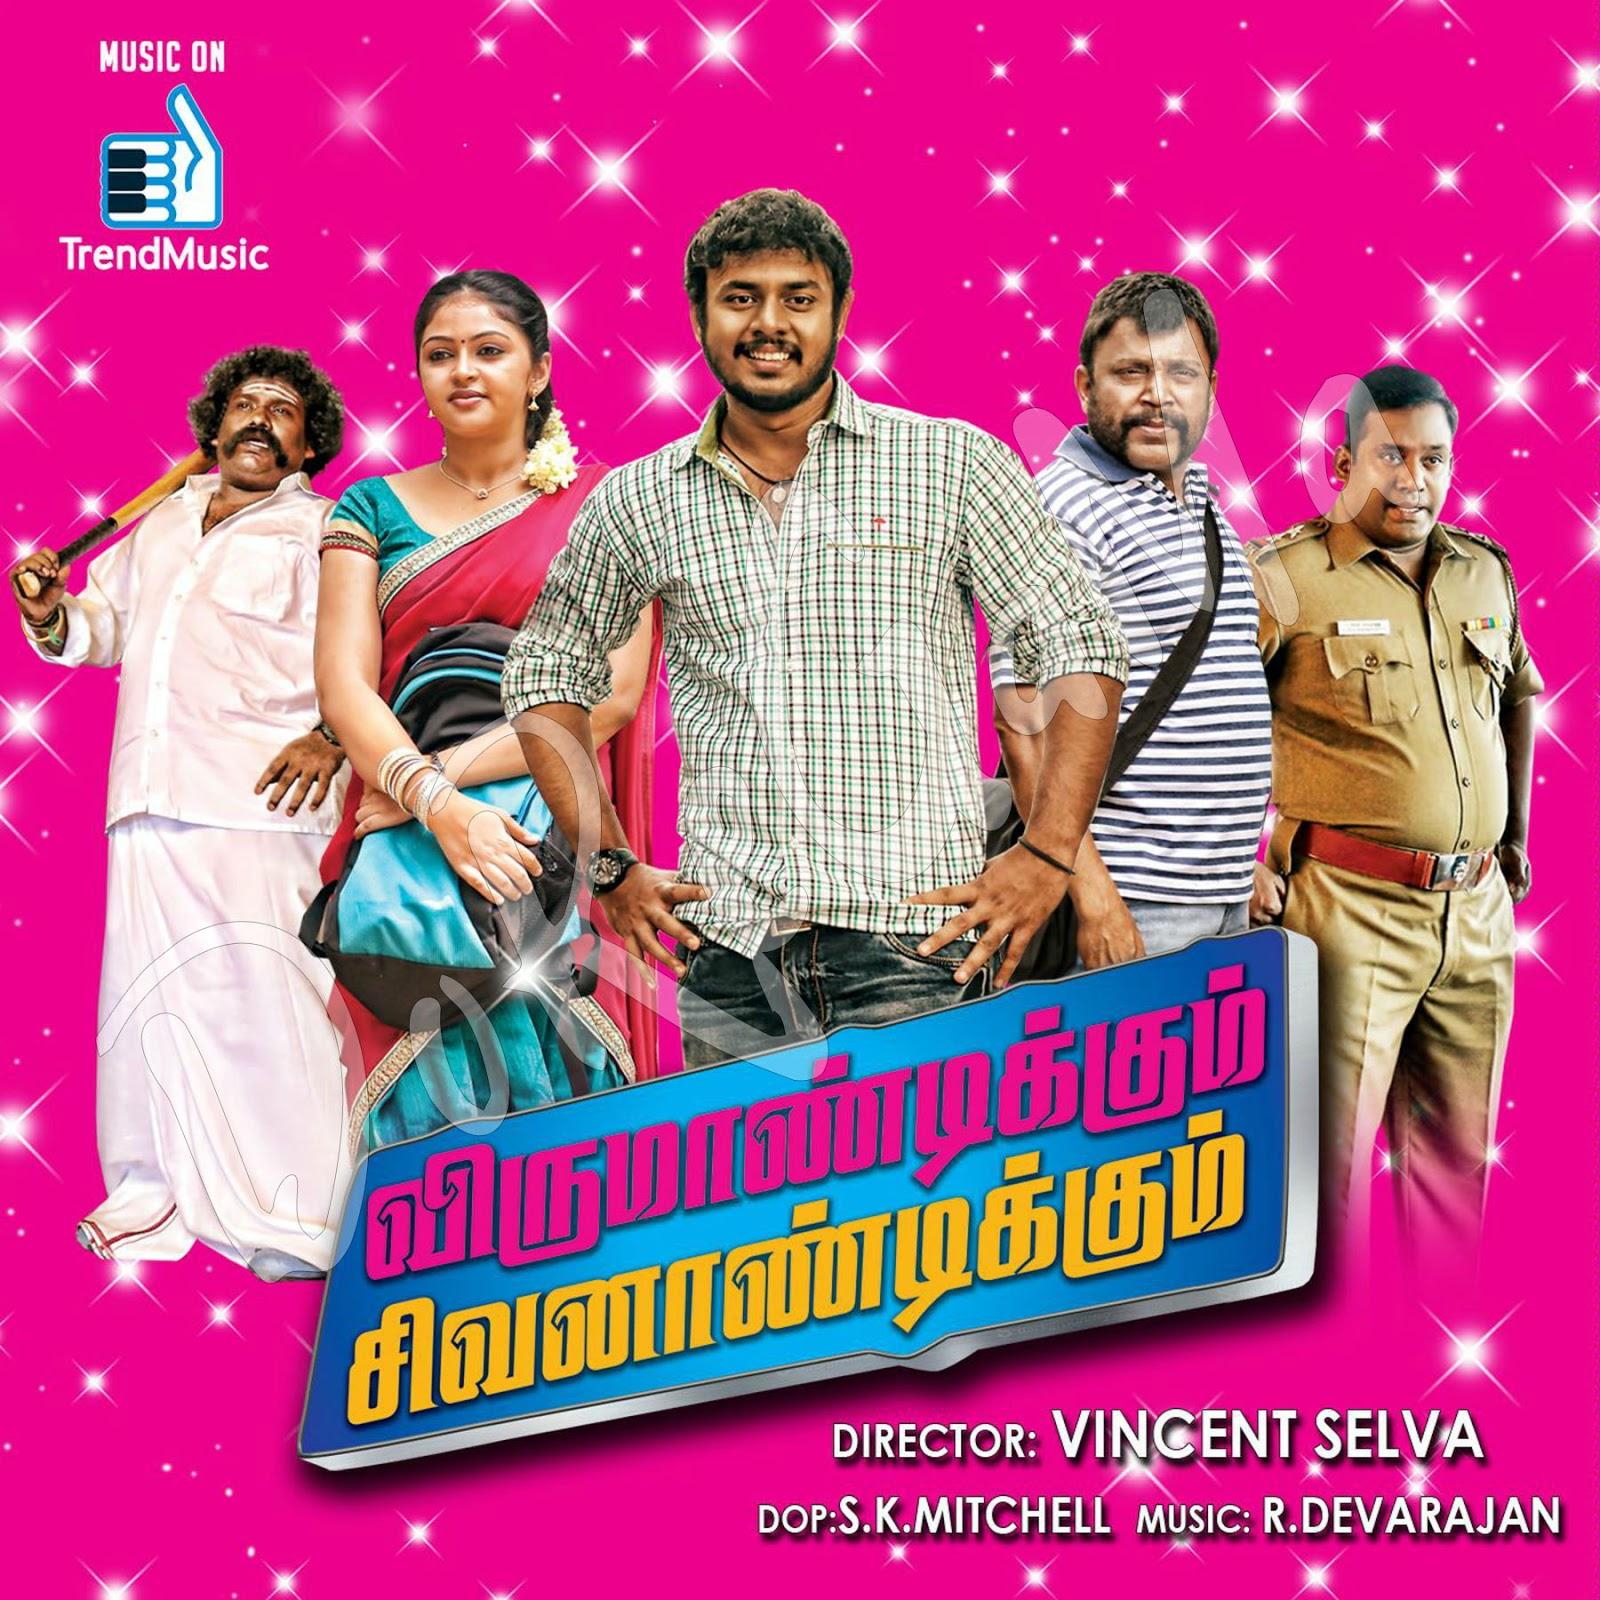 Virumandikkum Sivanandikkum 2016 Original CD Front Cover Poster Wallpaper HD